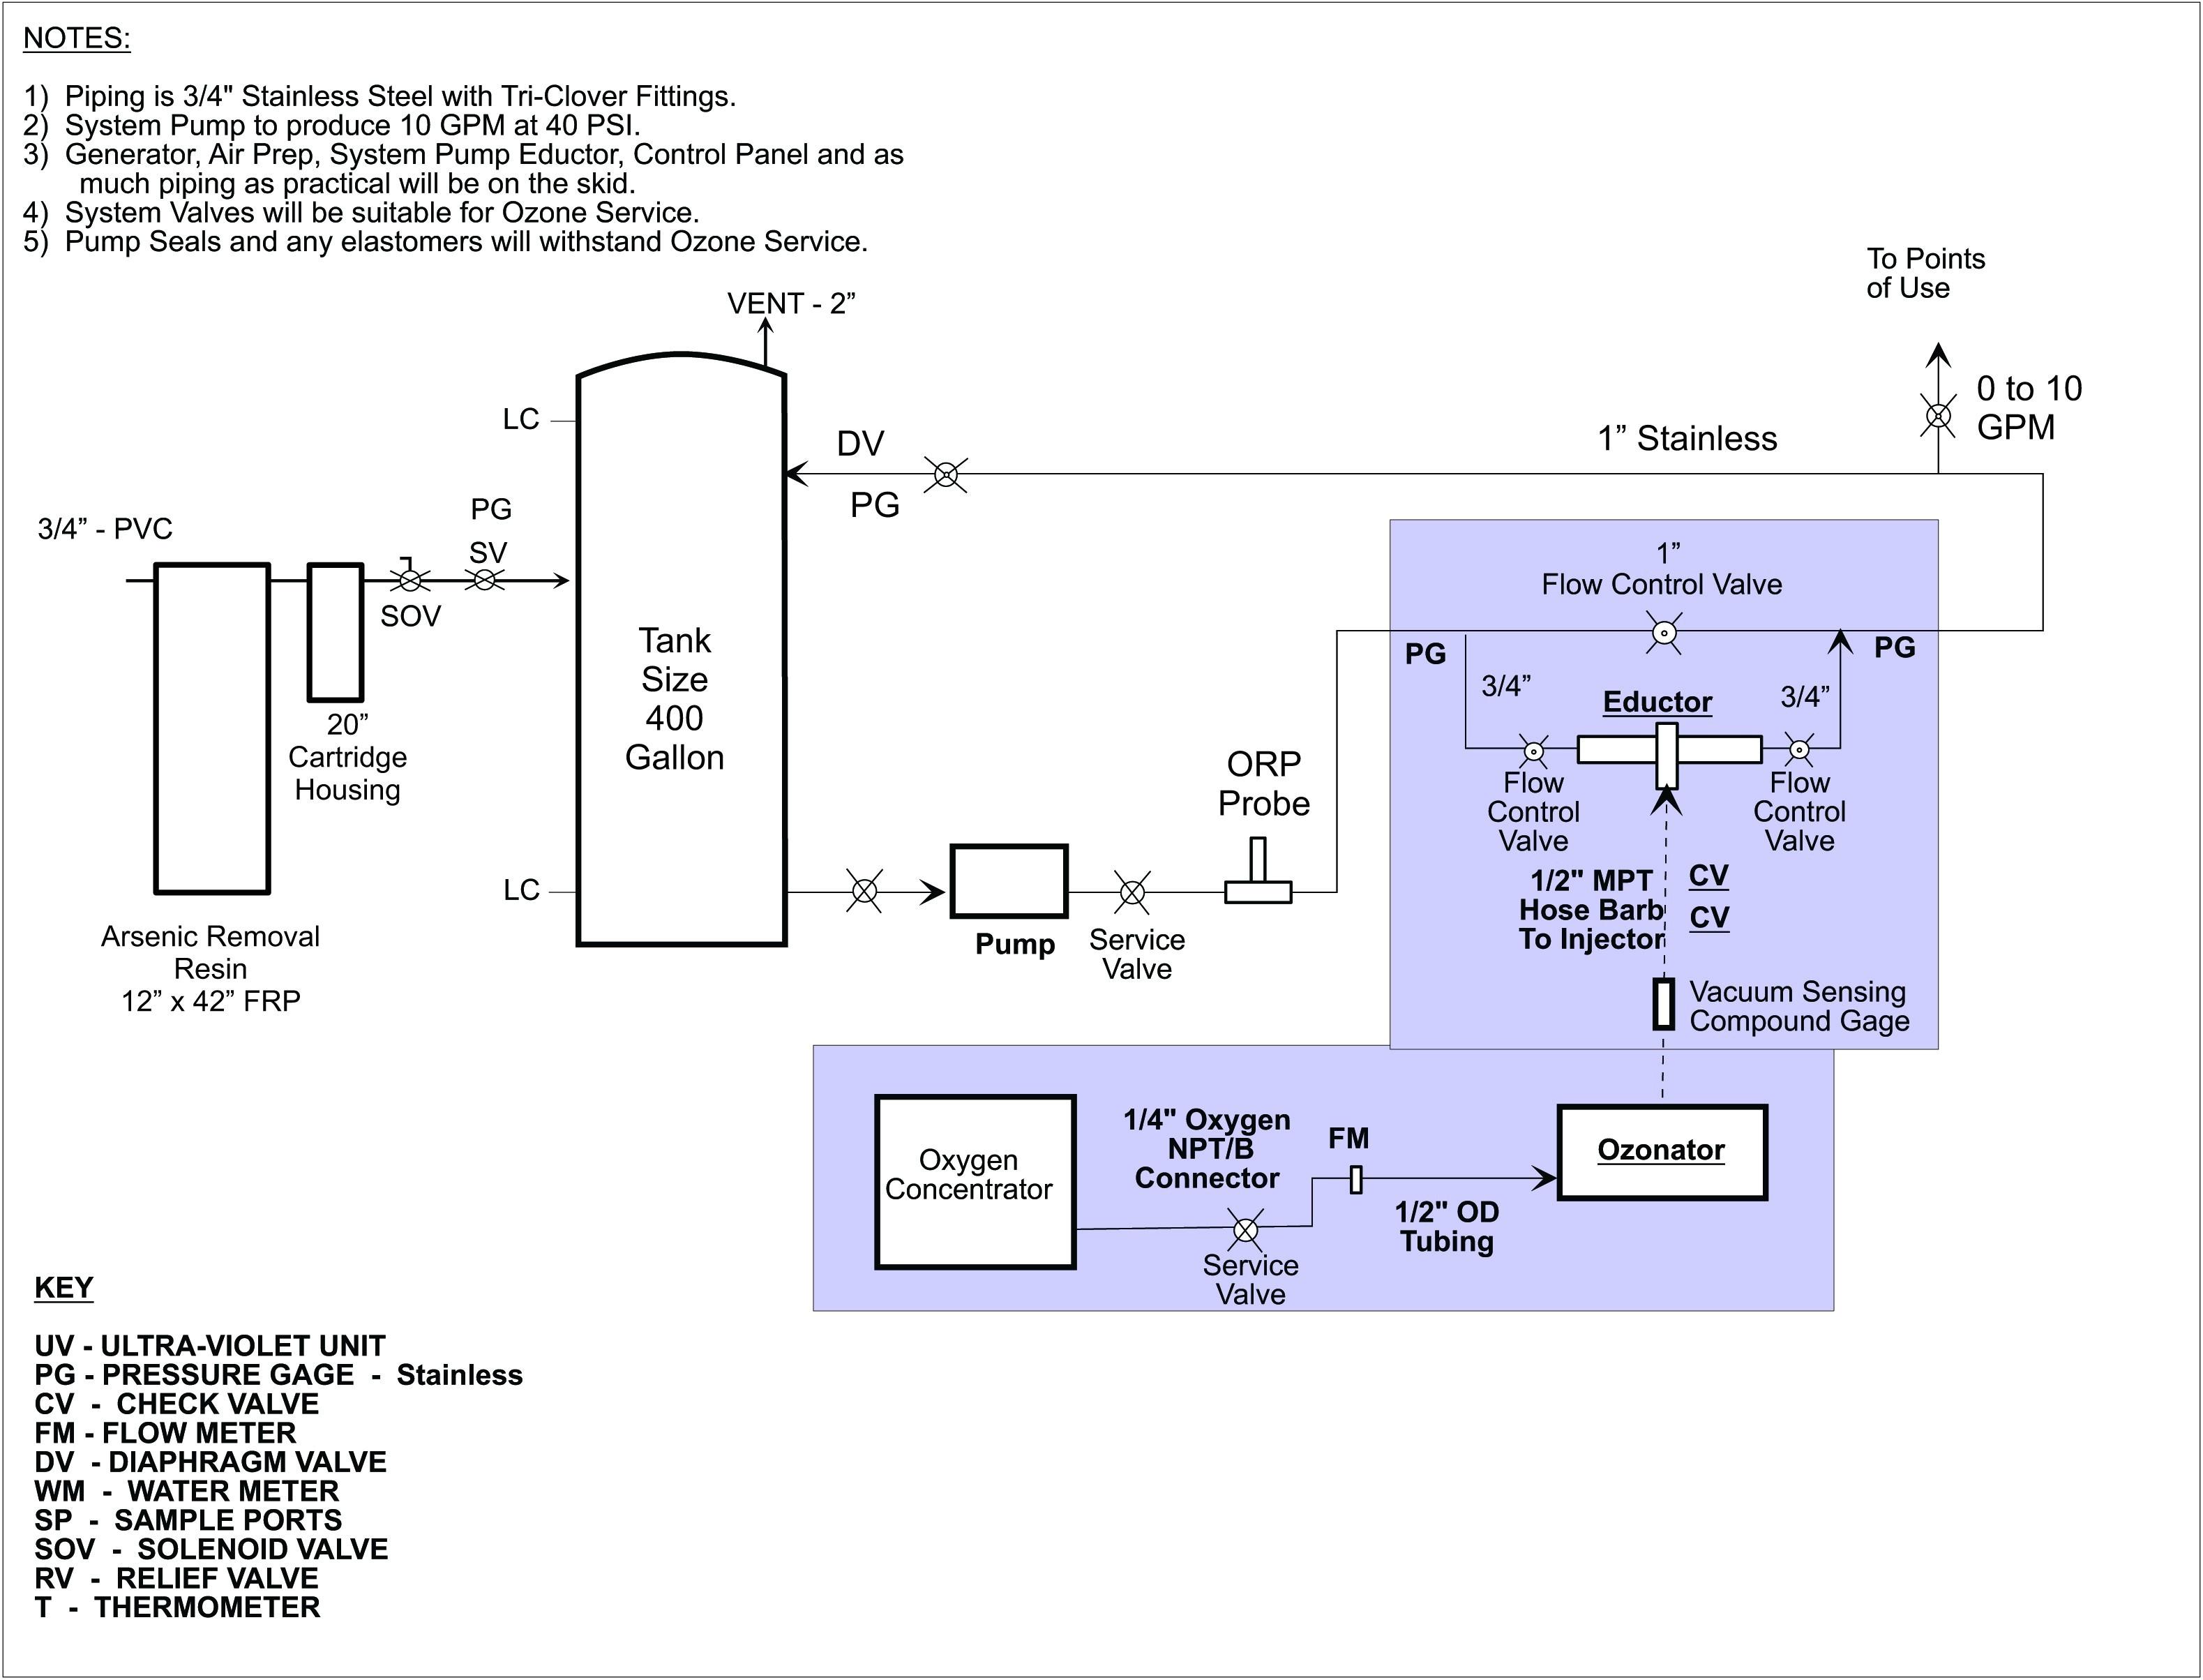 bee trailer wire diagram wiring diagram expert bee trailer wire diagram